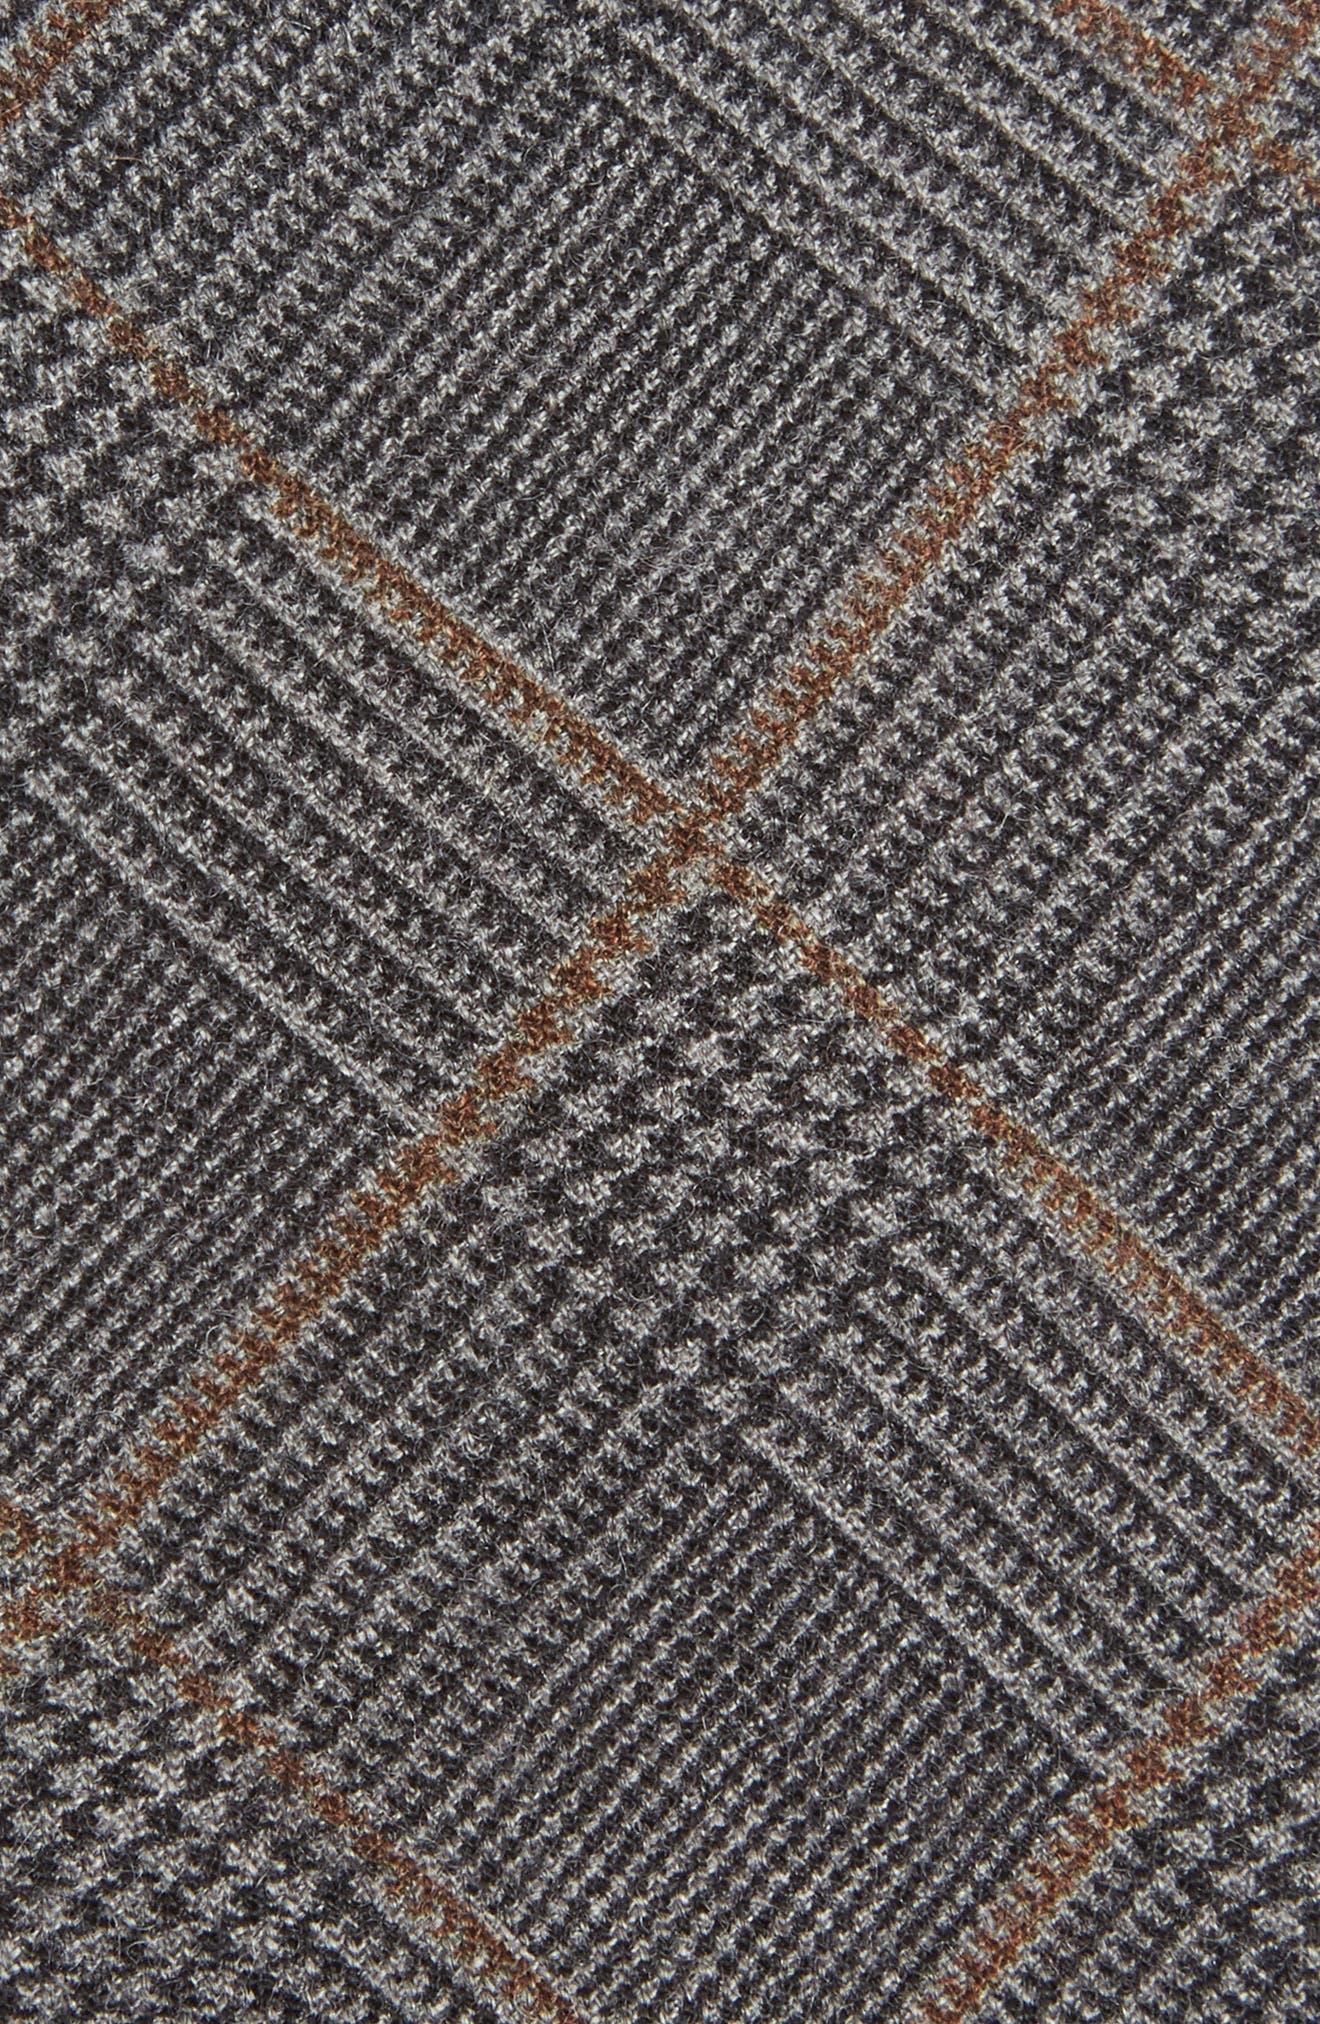 Dupont Glen Plaid Wool Tie,                             Alternate thumbnail 2, color,                             400